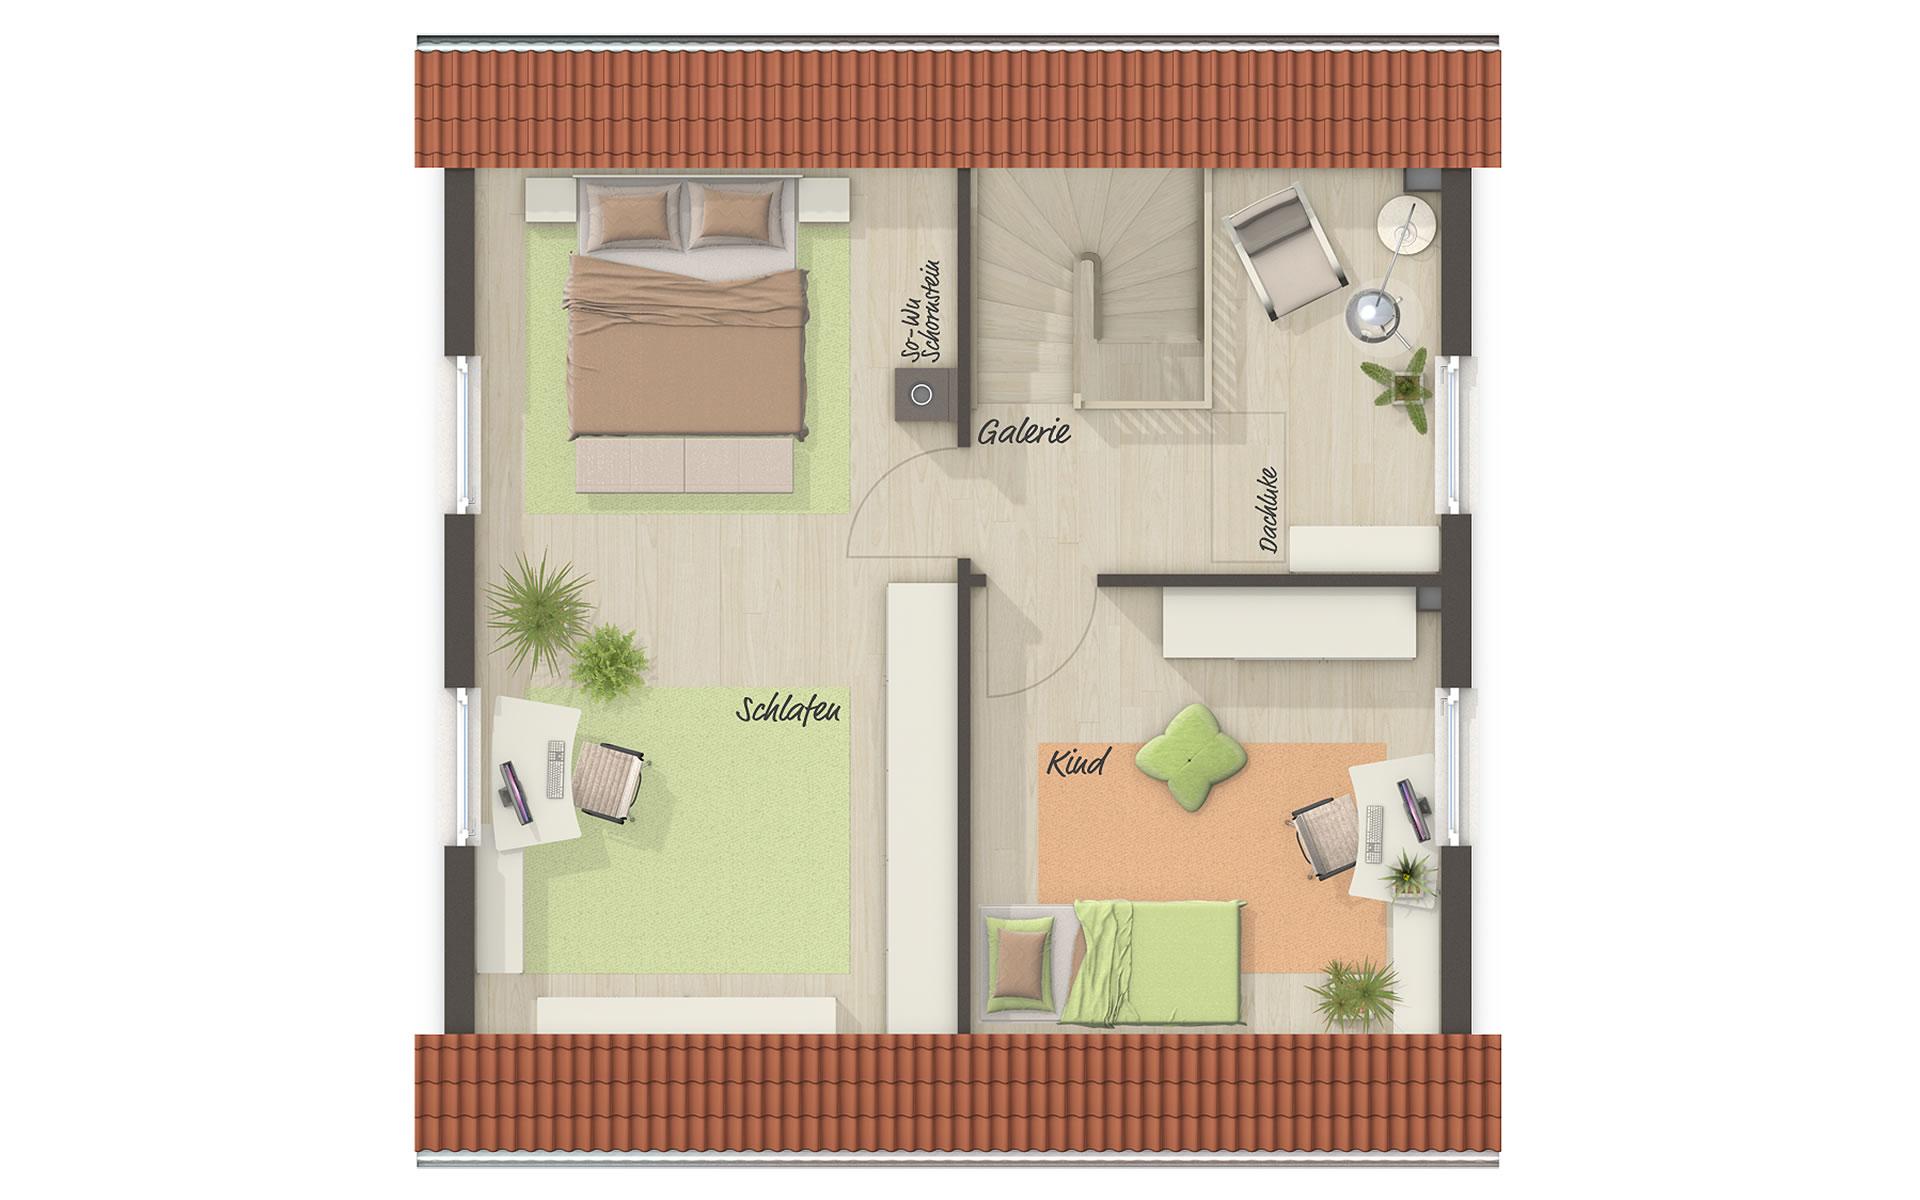 Dachgeschoss Aktionshaus Aspekt 90 von Town & Country Haus Lizenzgeber GmbH